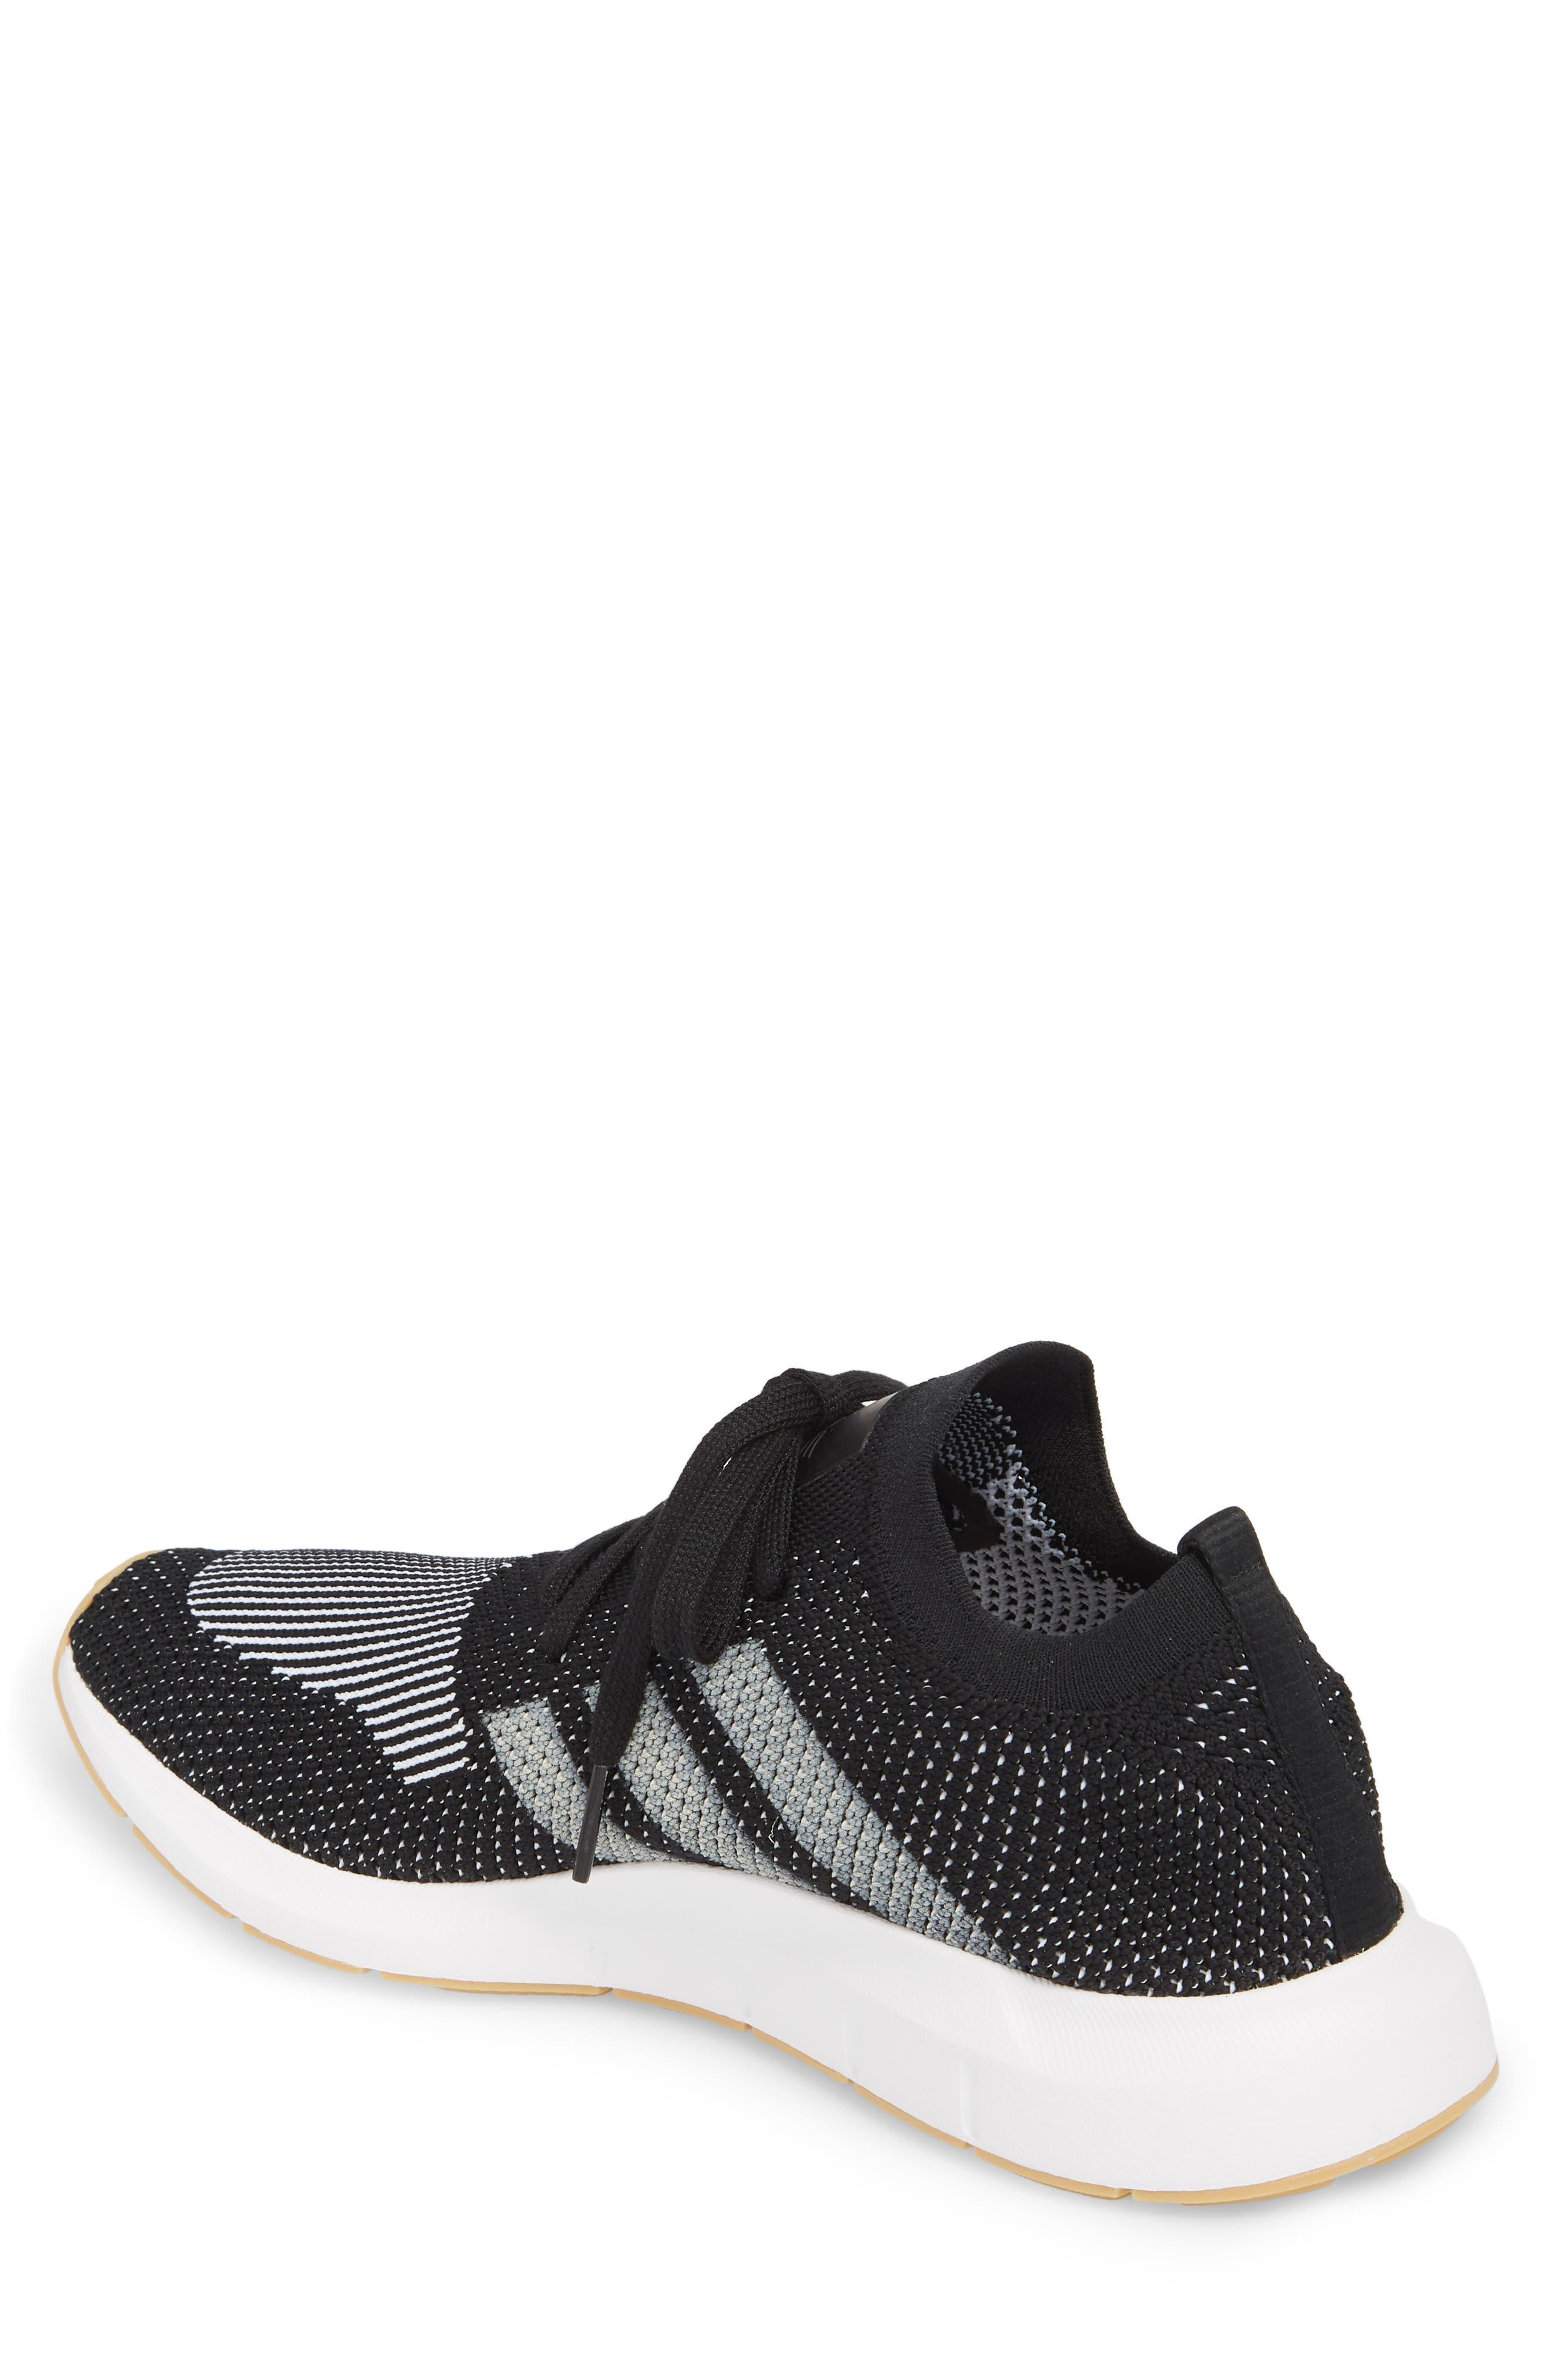 Swift Run Primeknit Sneaker,                             Alternate thumbnail 2, color,                             001